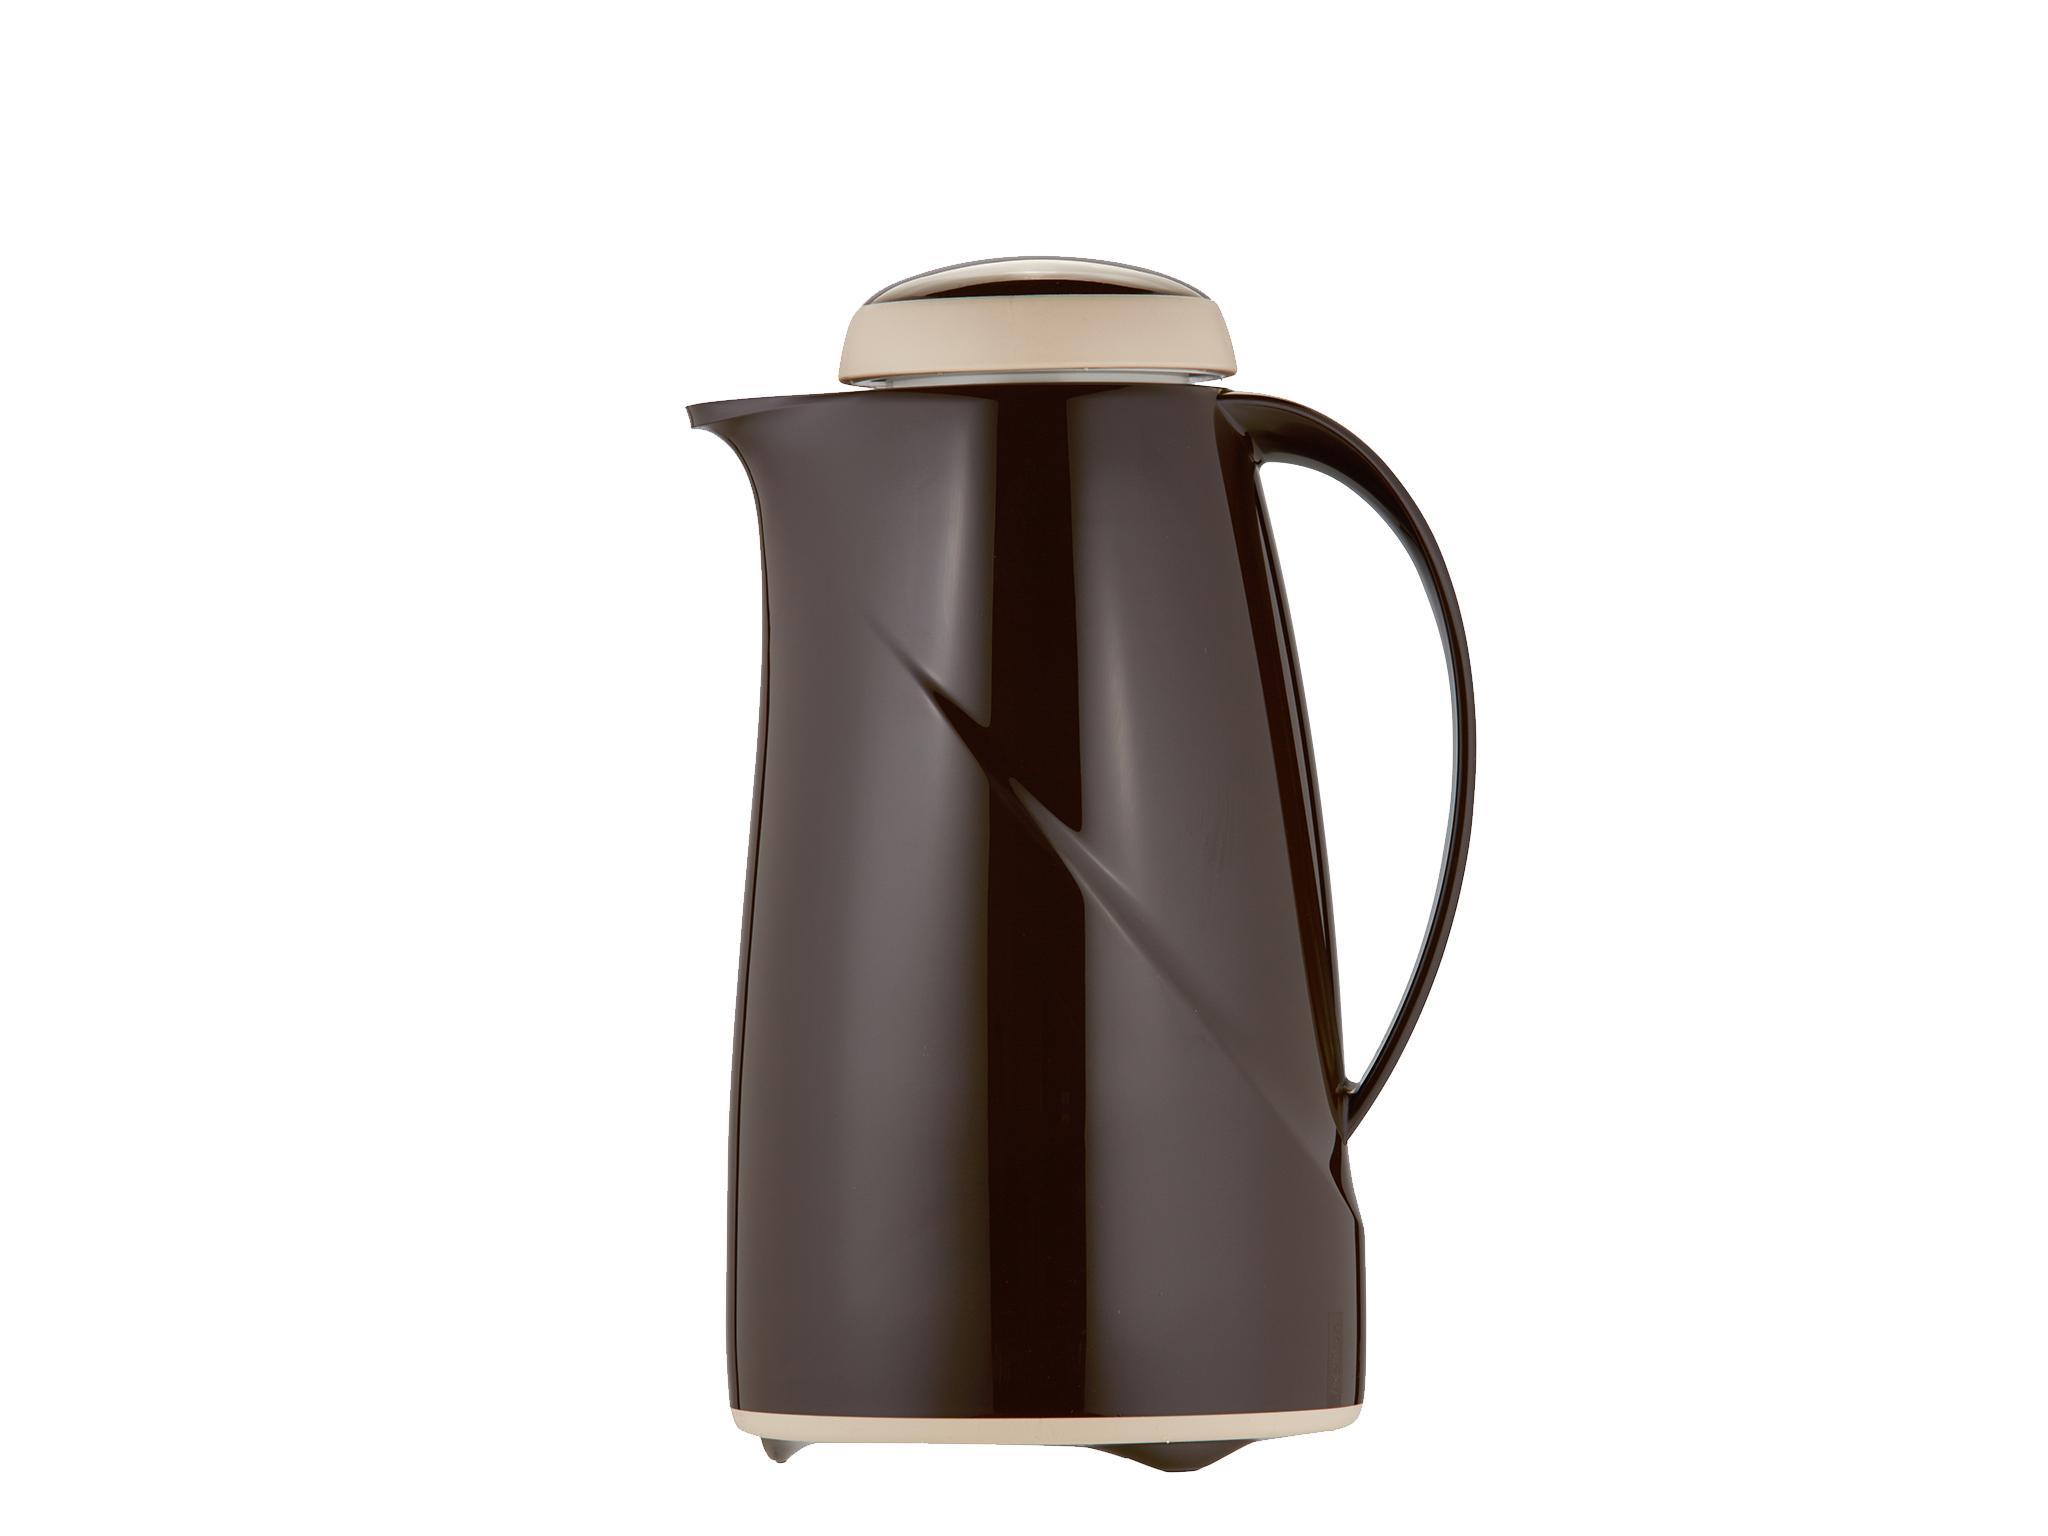 2964-123 - Vacuum carafe unbreakable cappuccino 1.0 L WAVE S+ - Helios